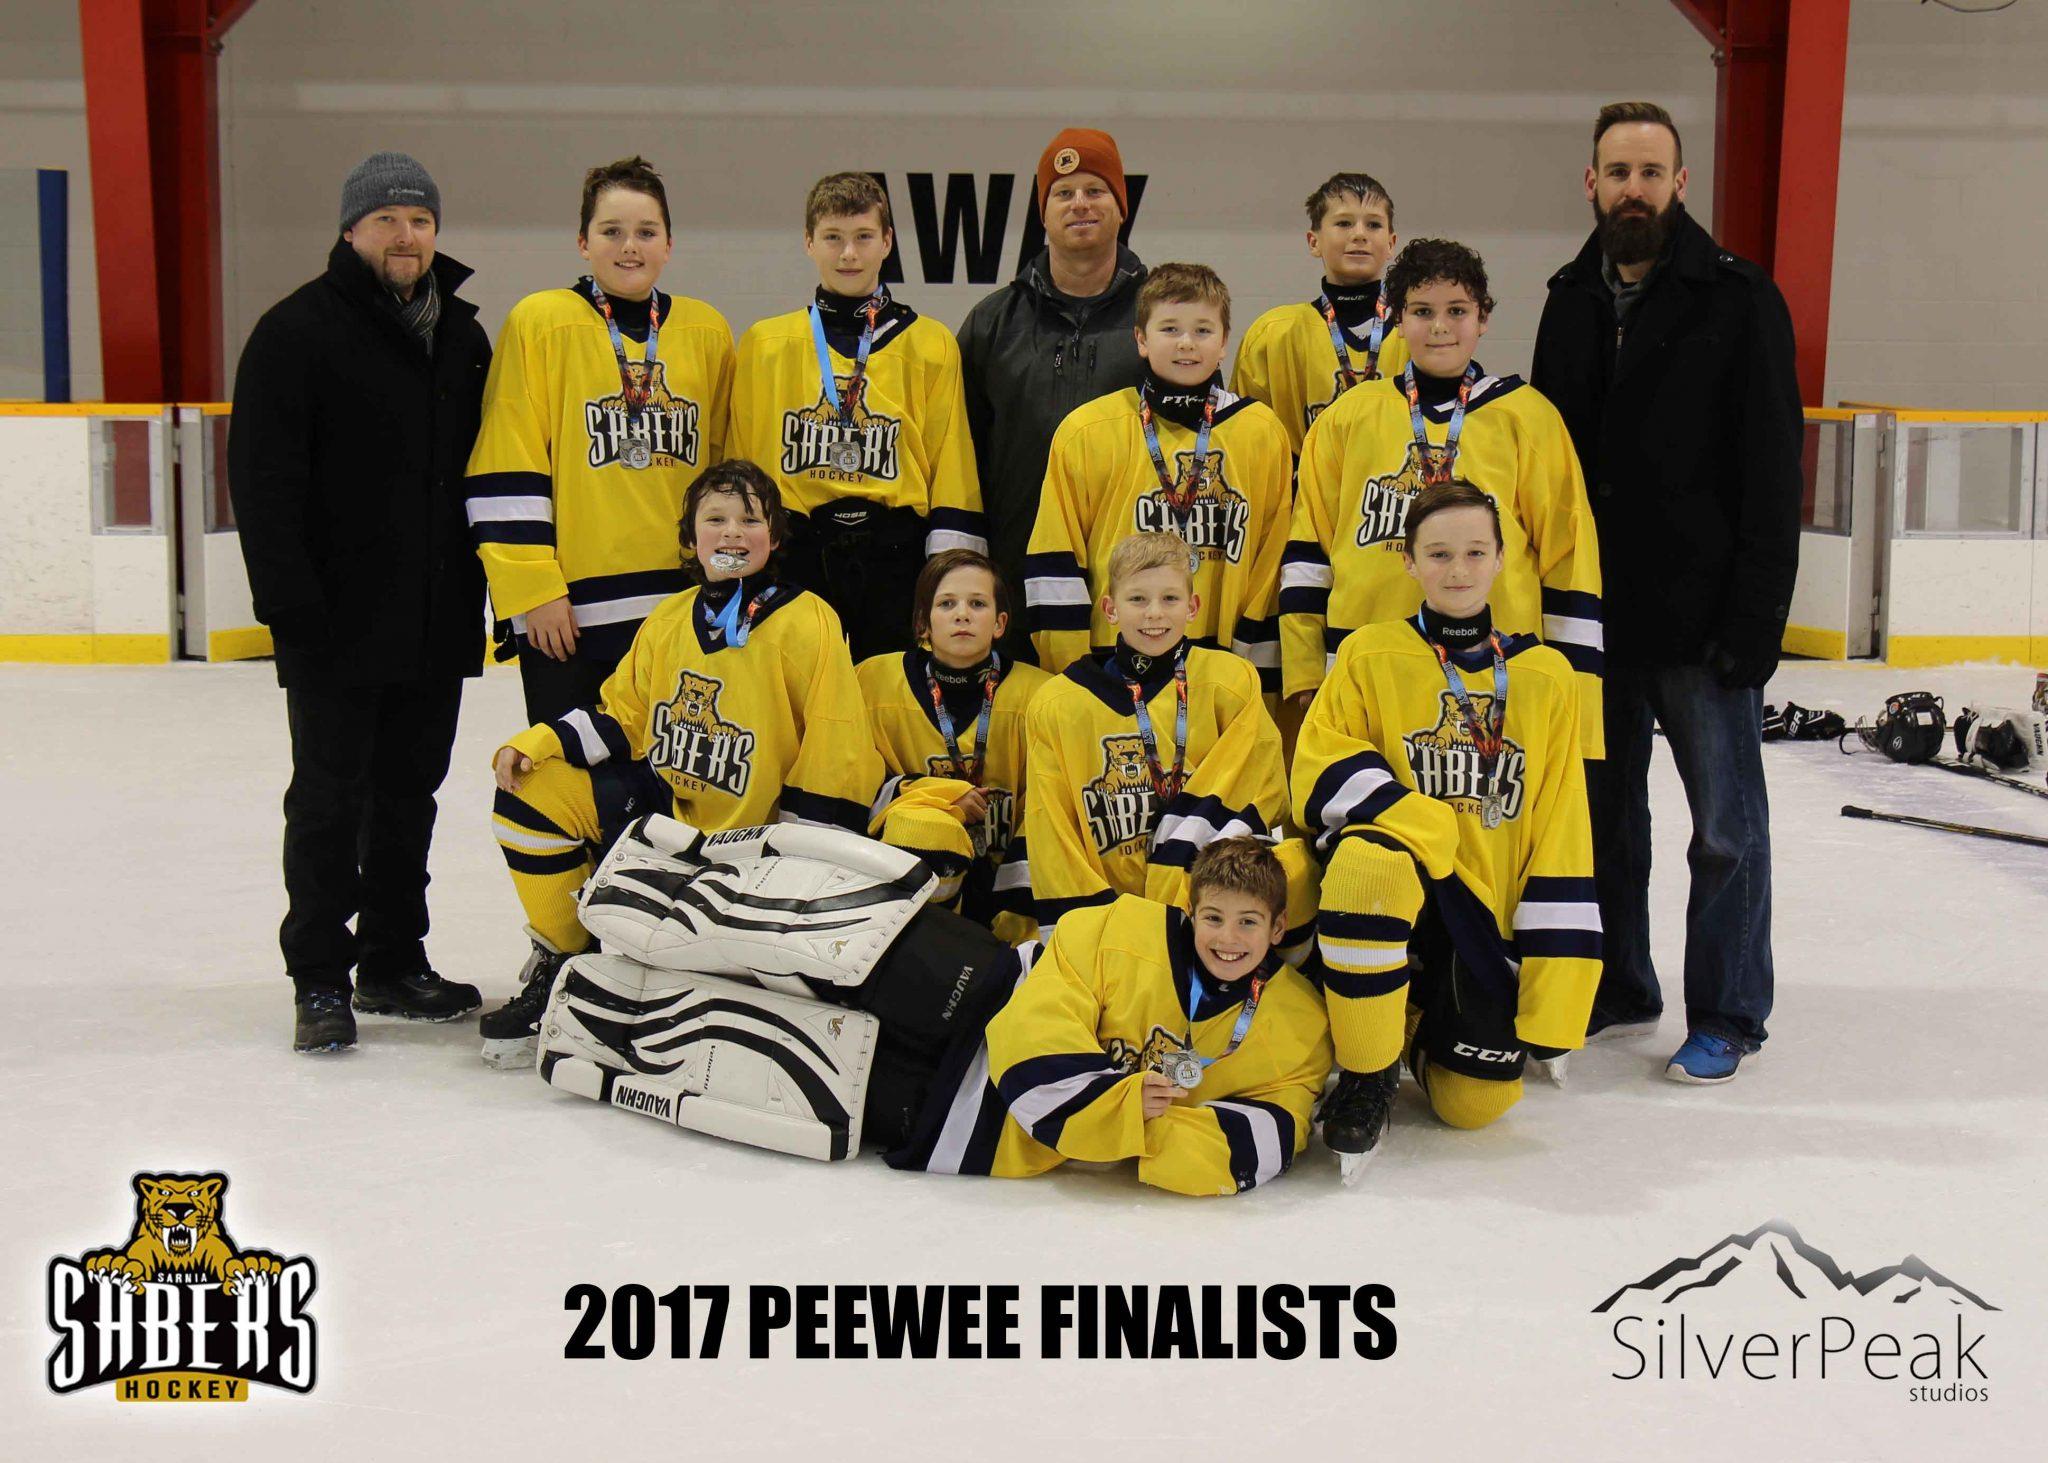 _Peewee Big Daddy Team Yellow Finalists